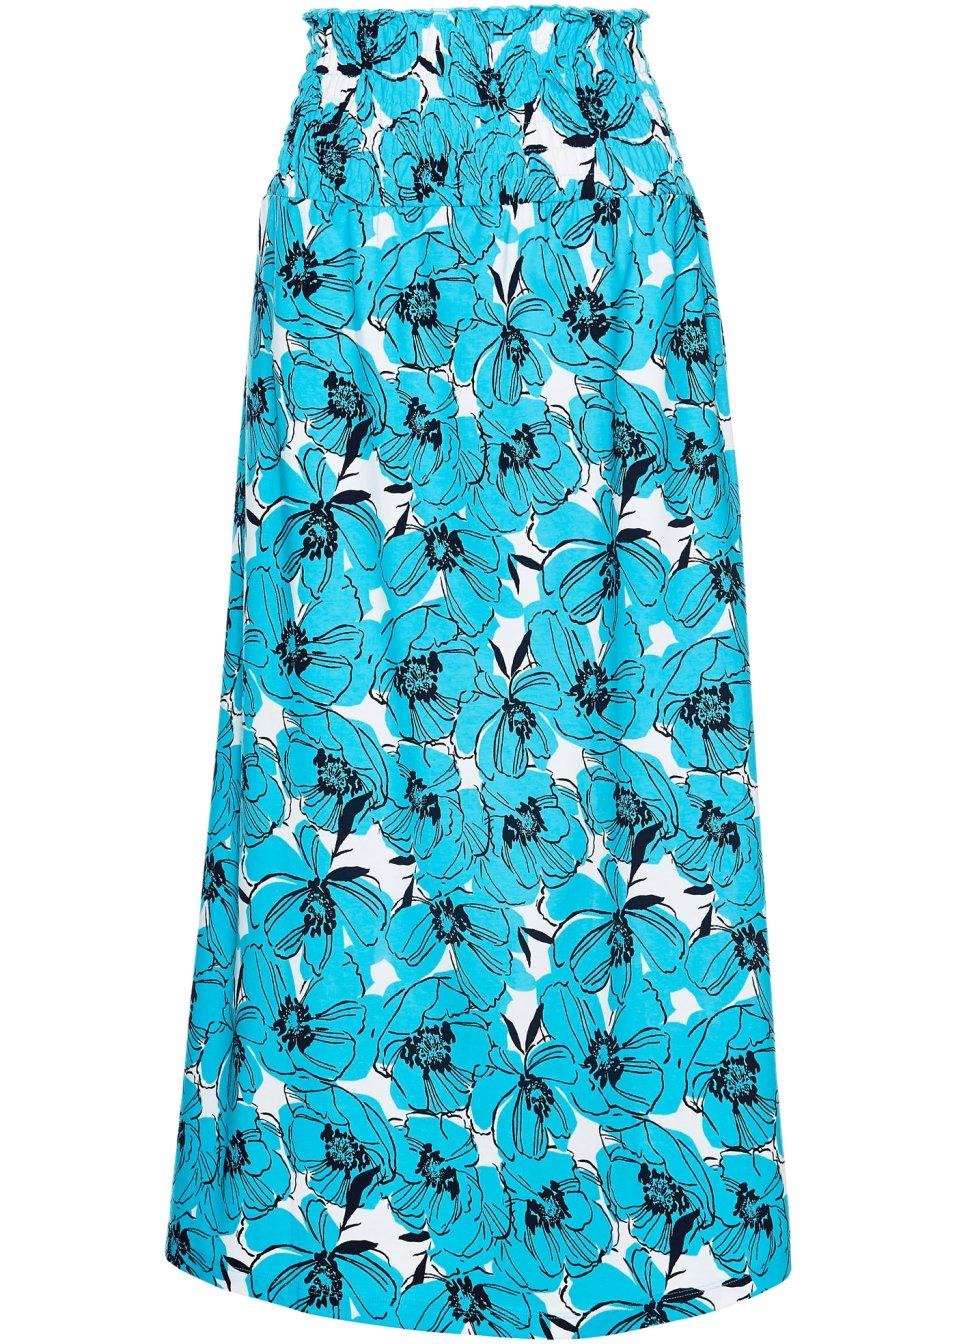 Jersey-Rock 2 in 1 weiß/karibikblau/blau - bpc selection online kaufen - bonprix.de f4F56 GHwEK